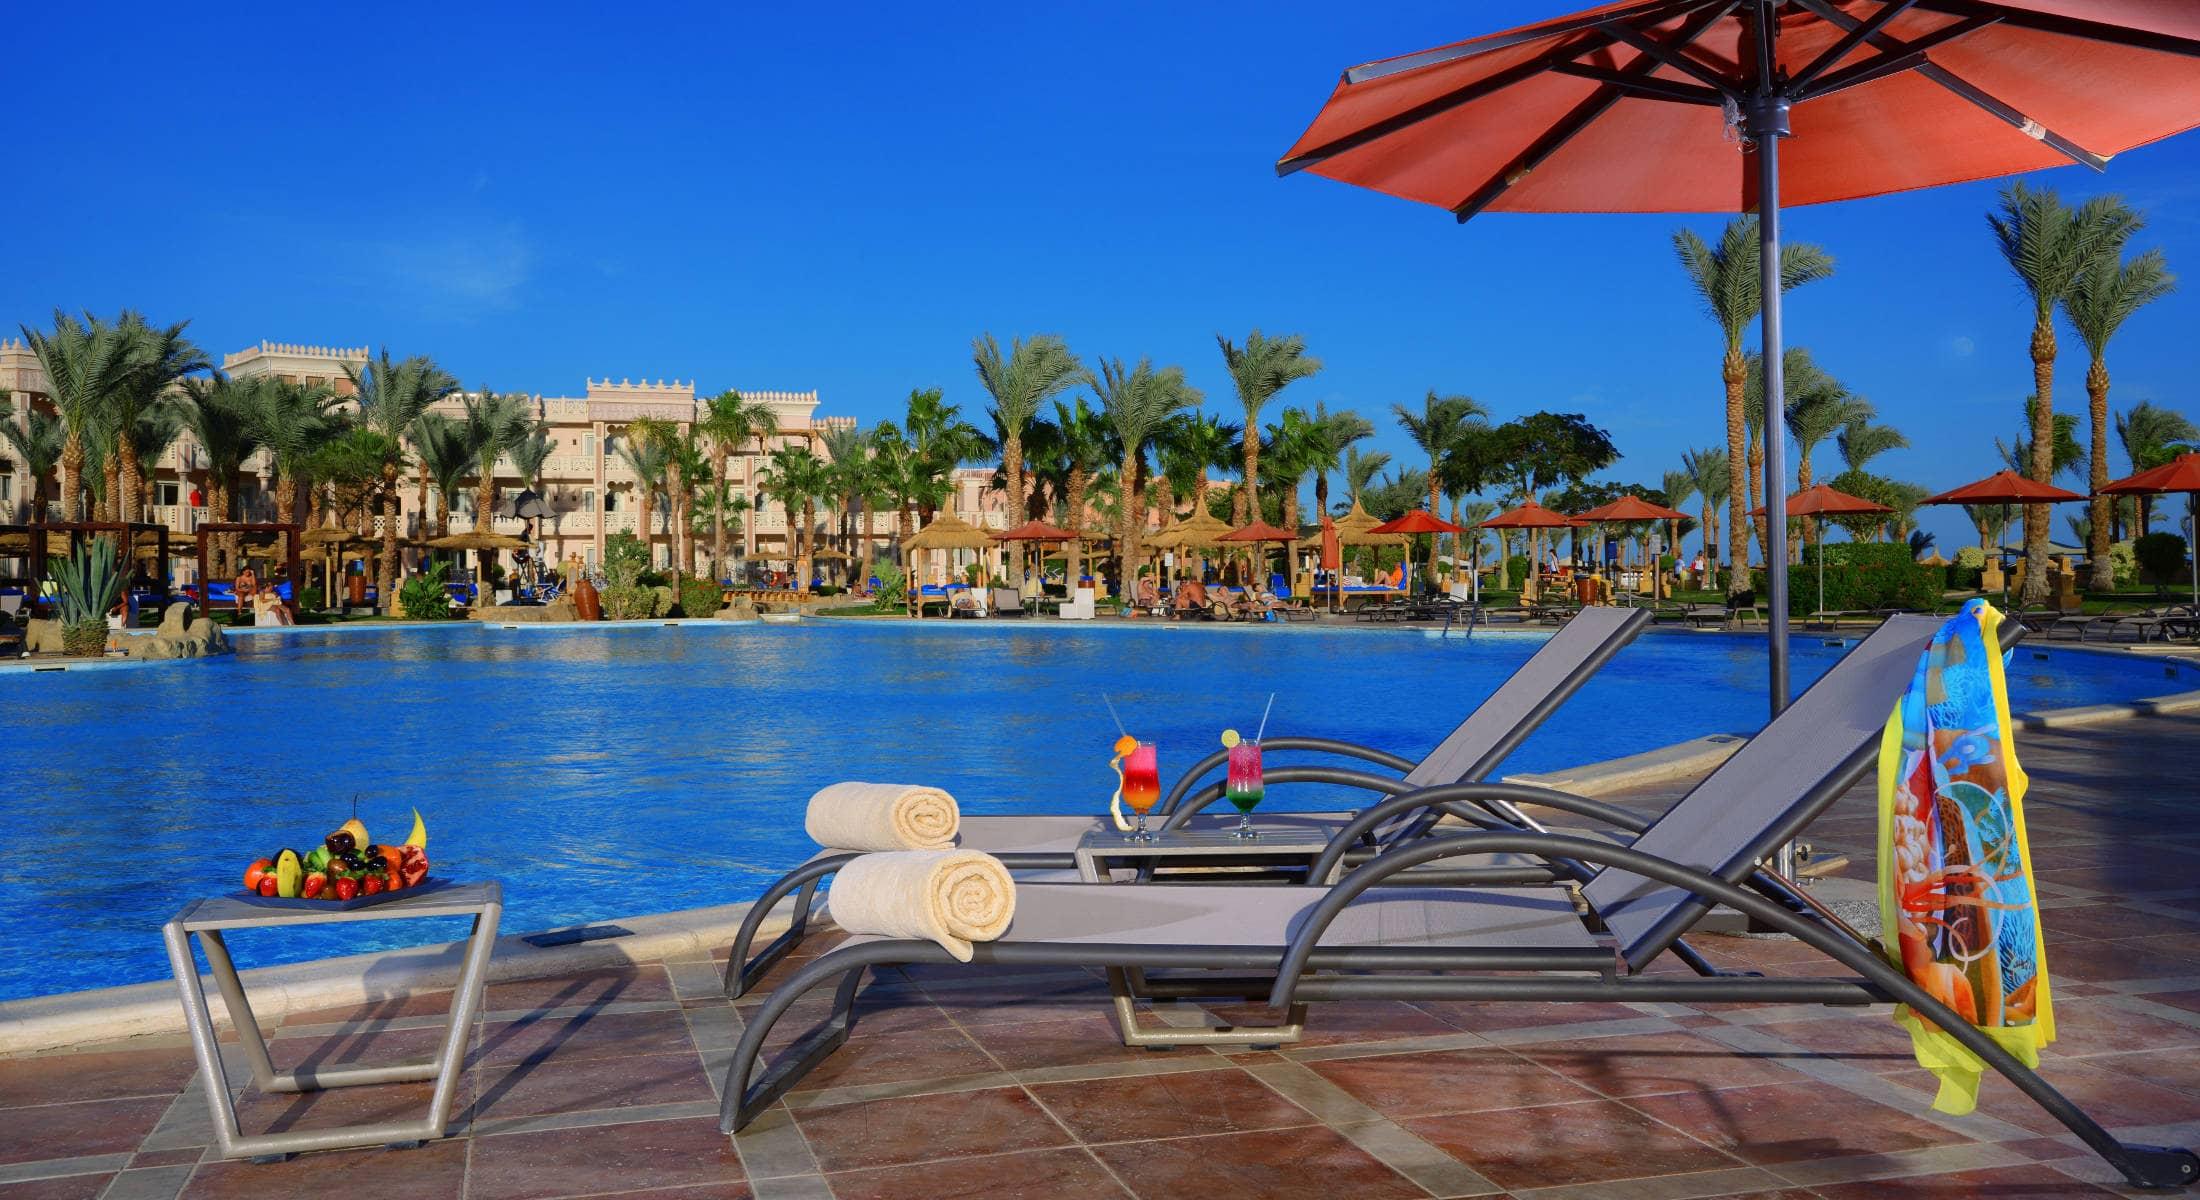 Hotels Resorts Albatros Palace Resort Pickalbatros Hotels